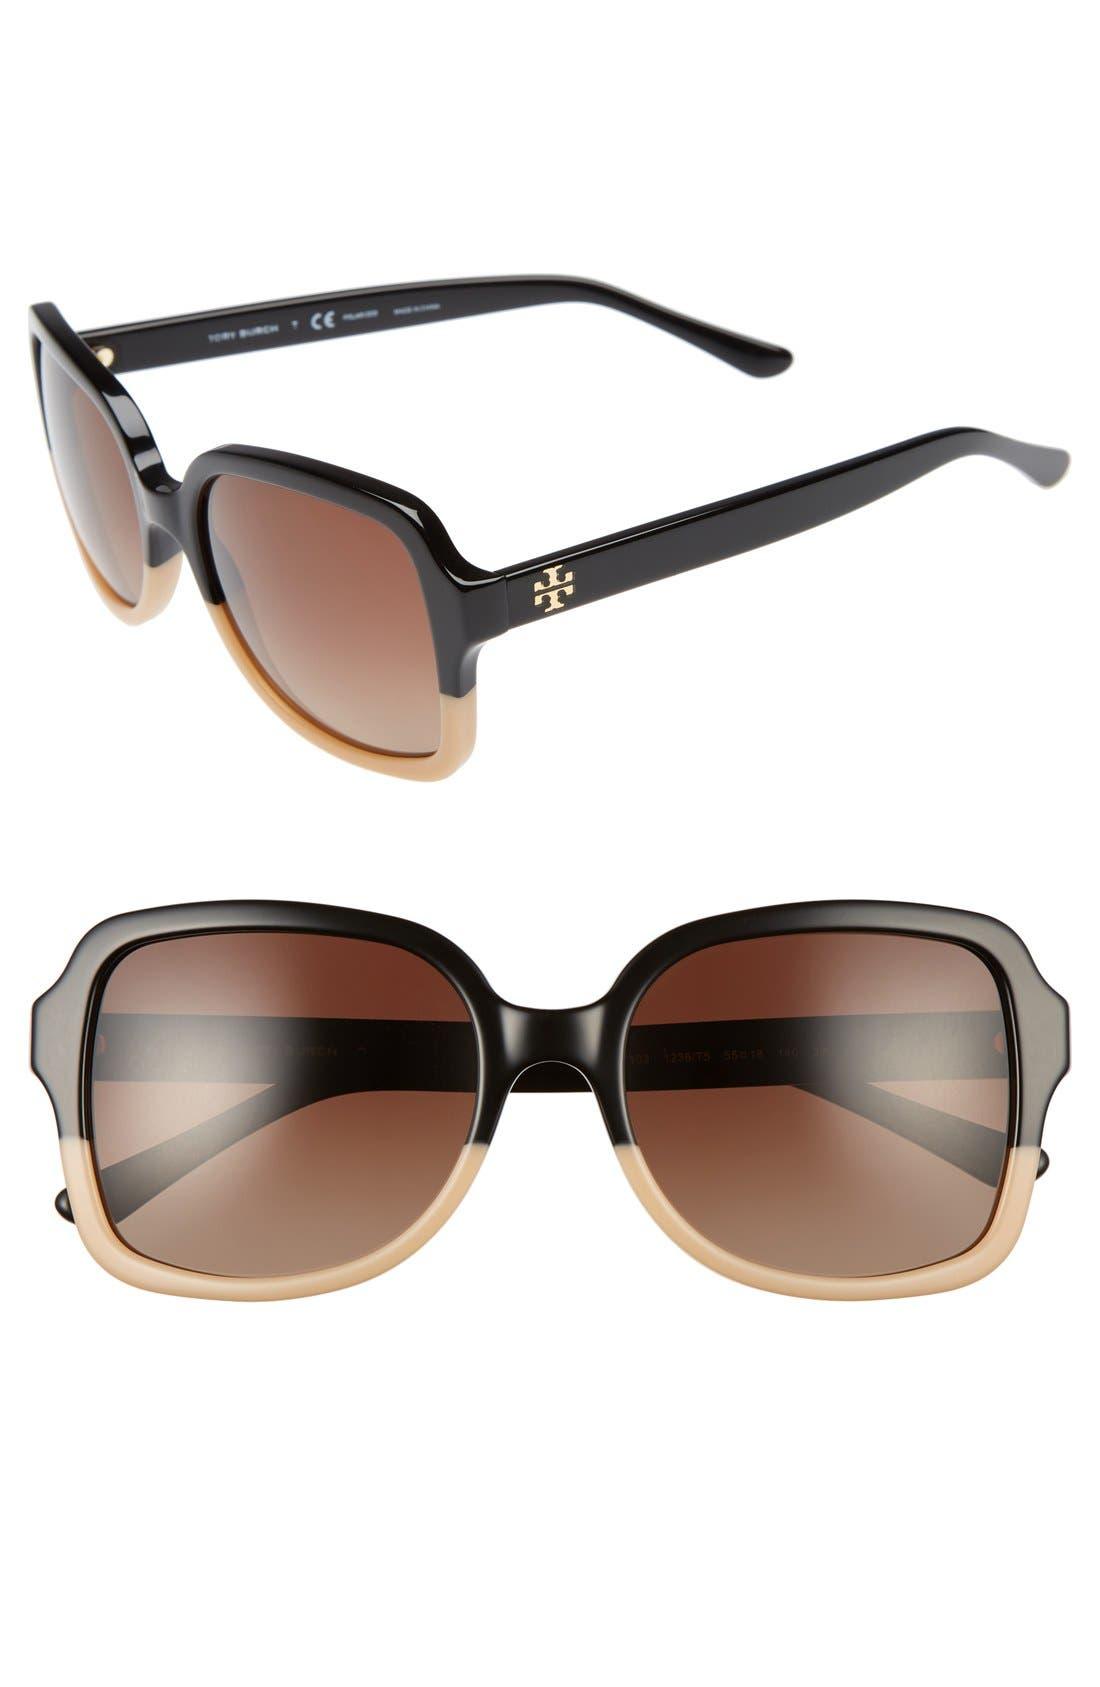 55mm Polarized Sunglasses,                         Main,                         color, 001